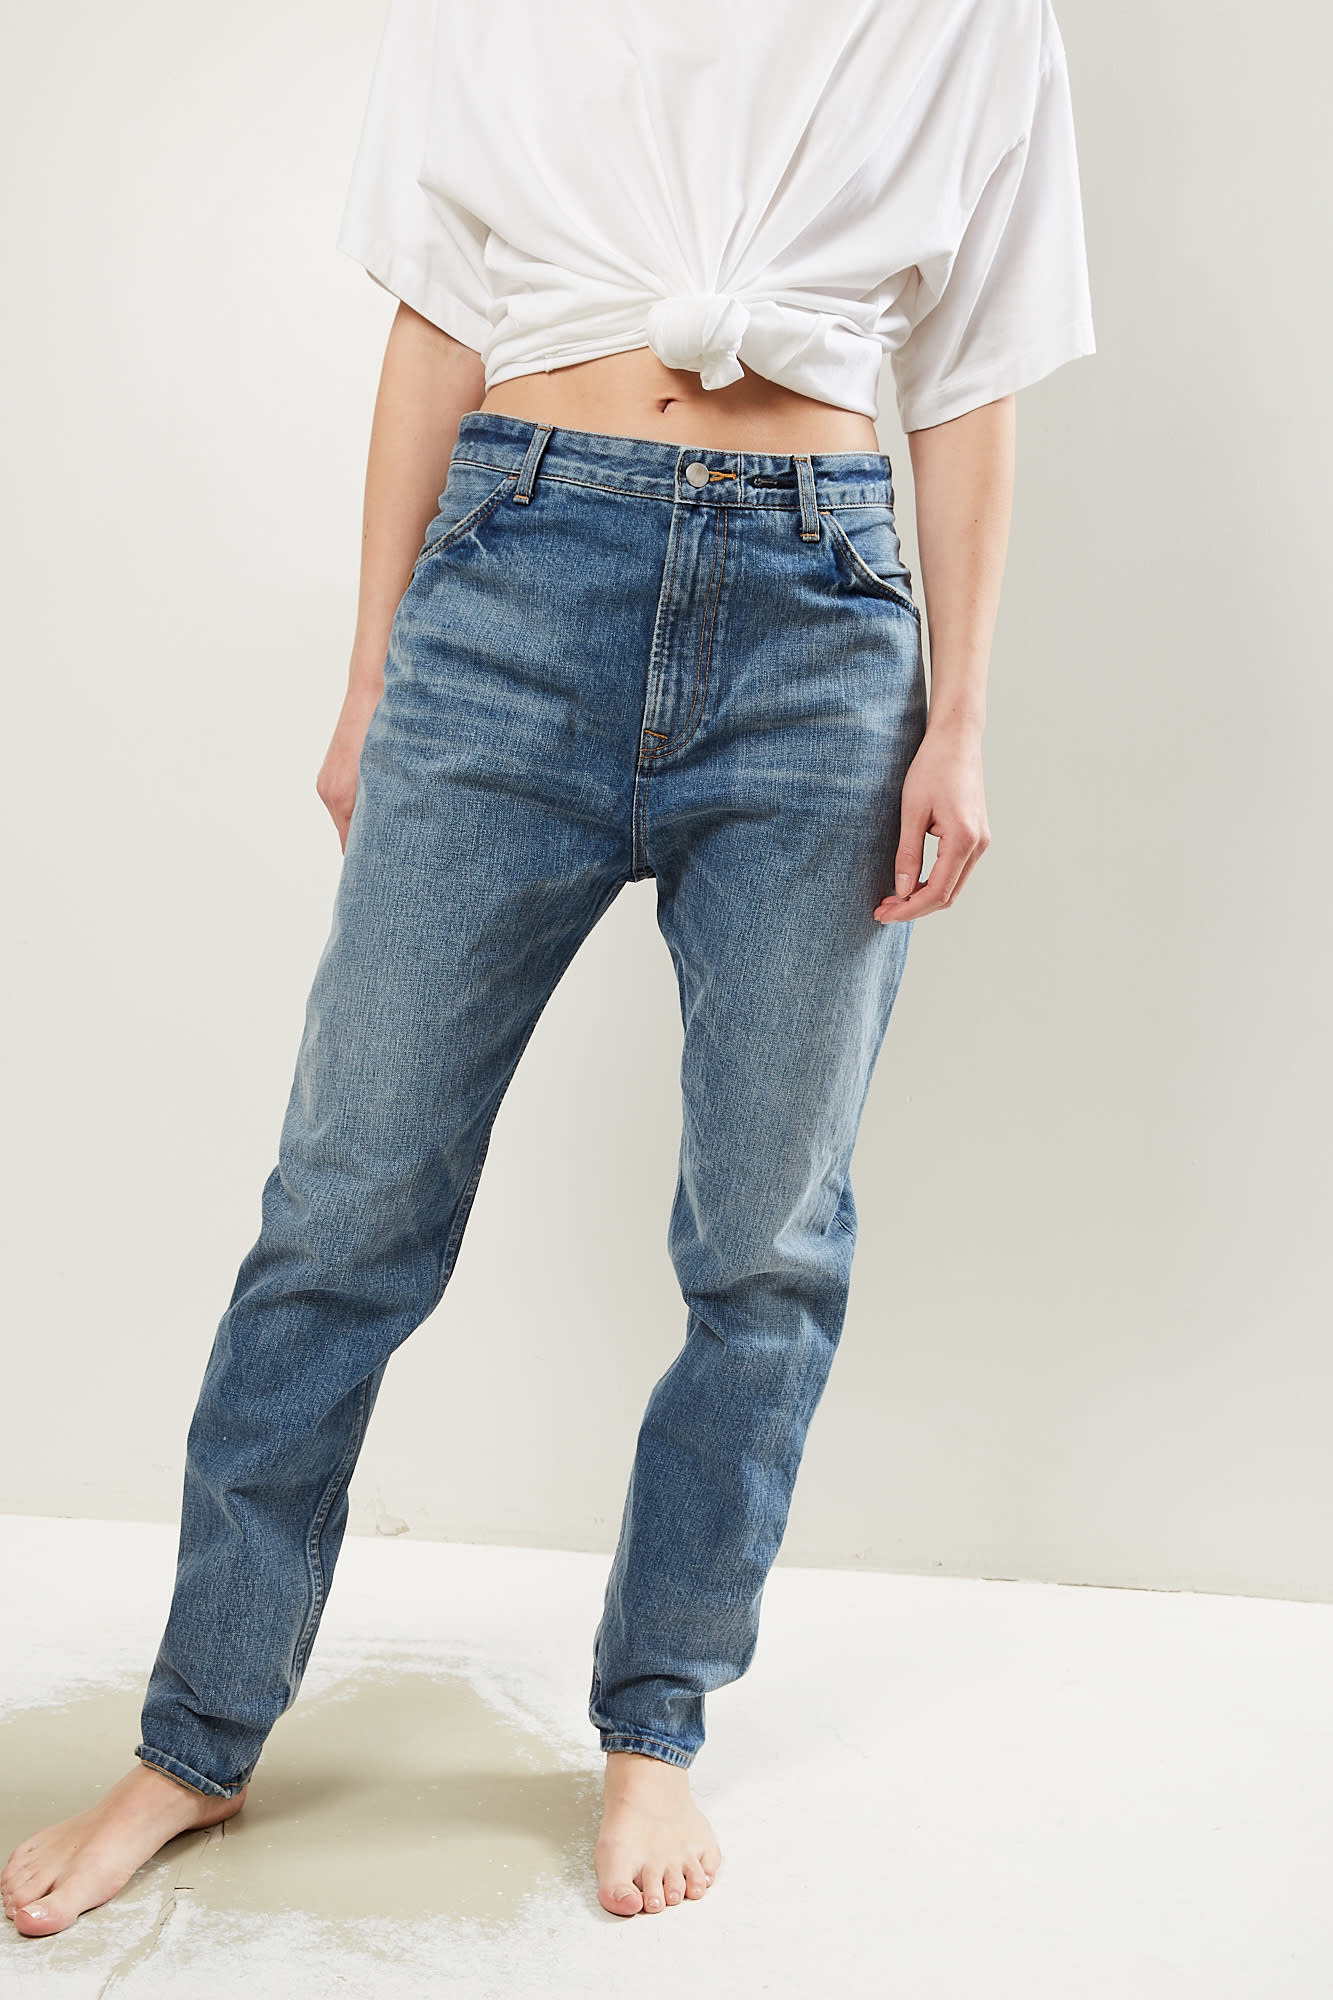 C. Cruden - C.C.01 5 pocket jeans